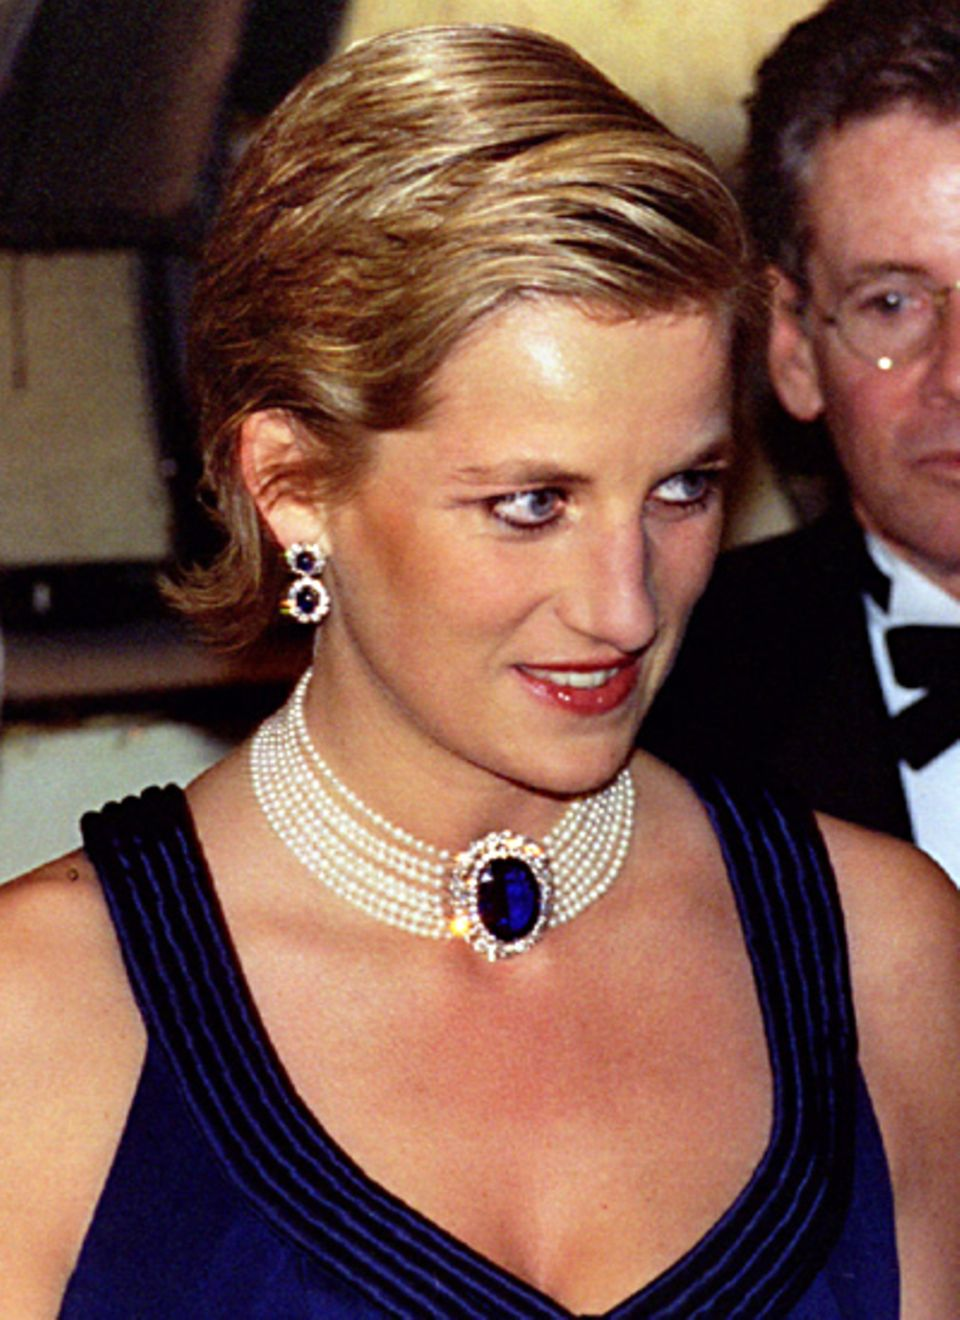 Royaler Schmuck - Prinzessin Diana